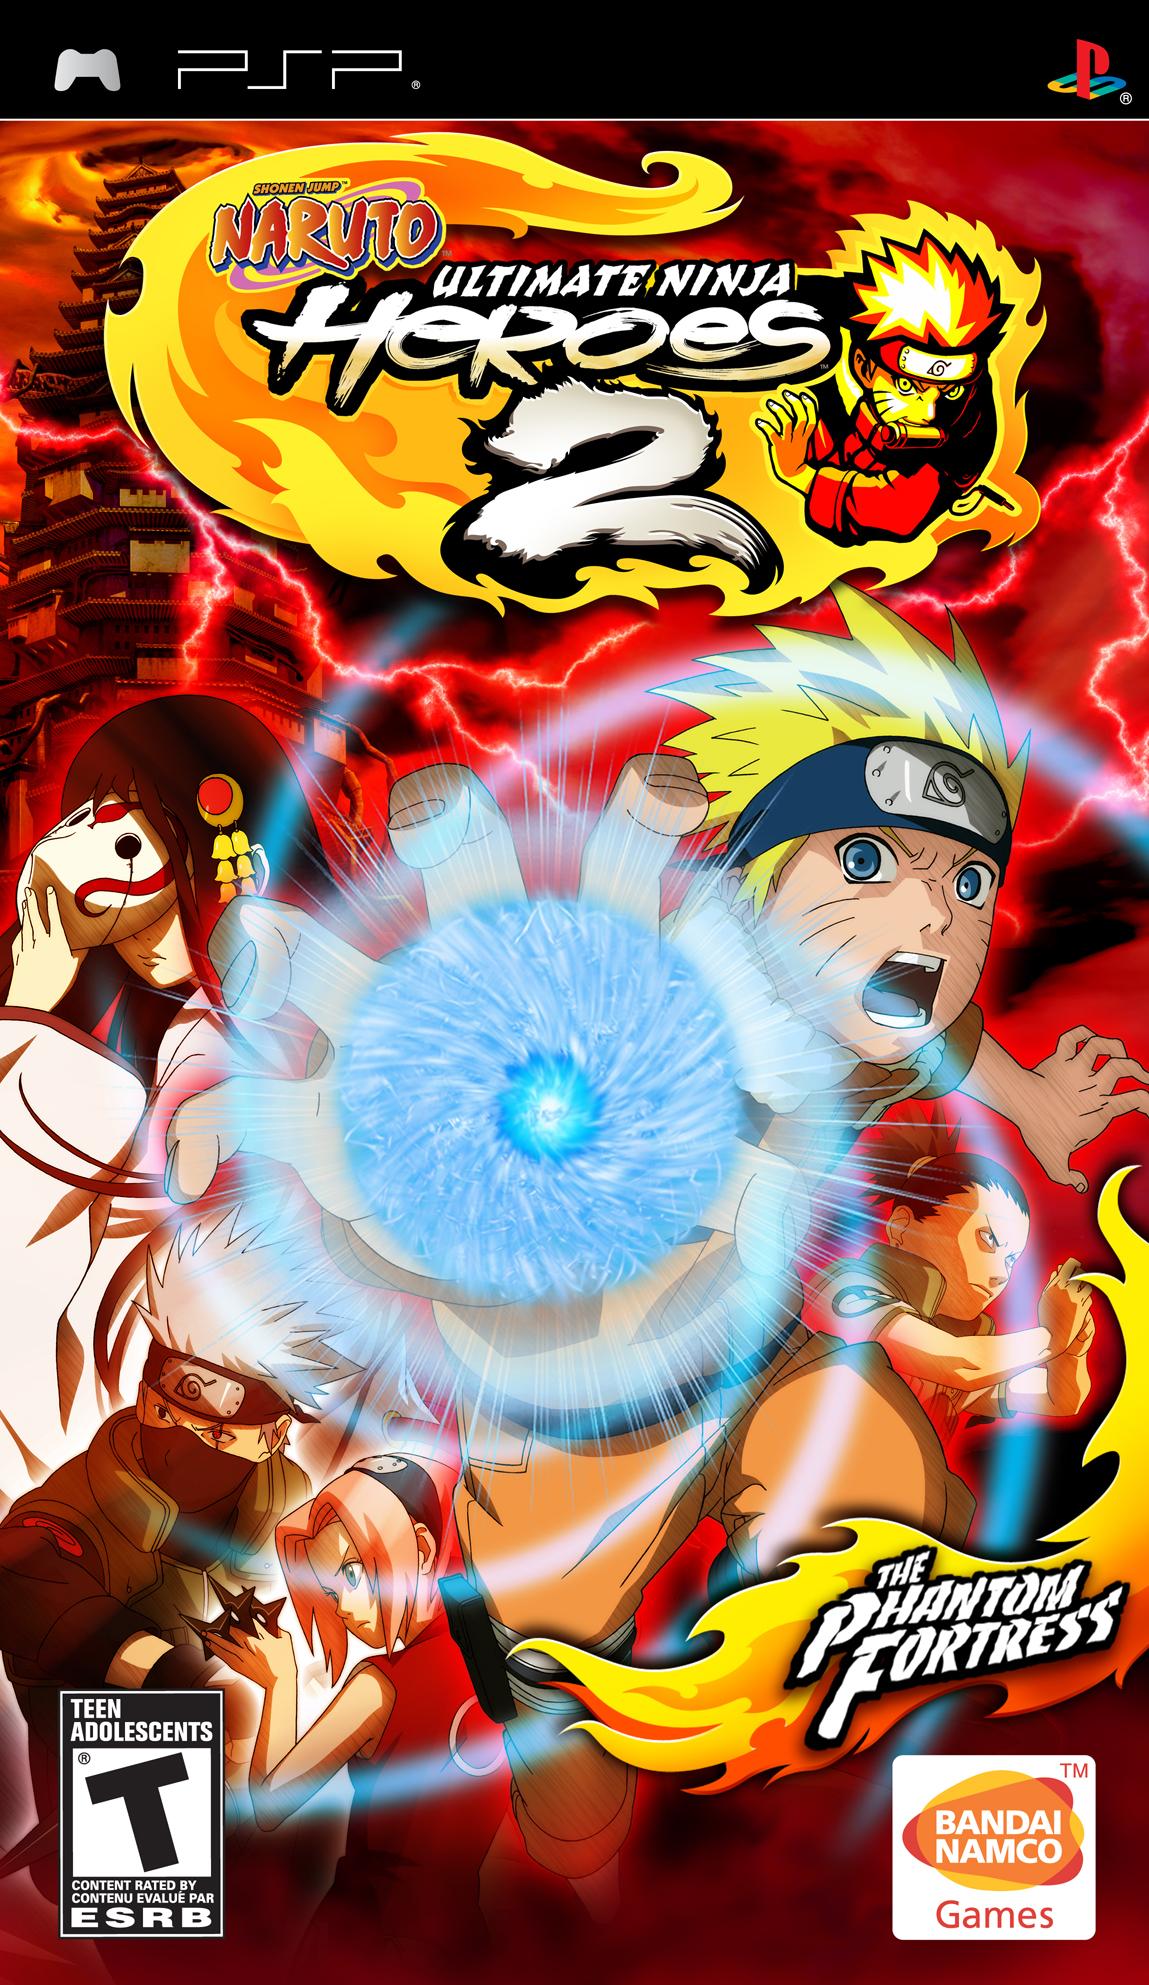 Naruto: Ultimate Ninja Heroes 2: The Phantom Fortress